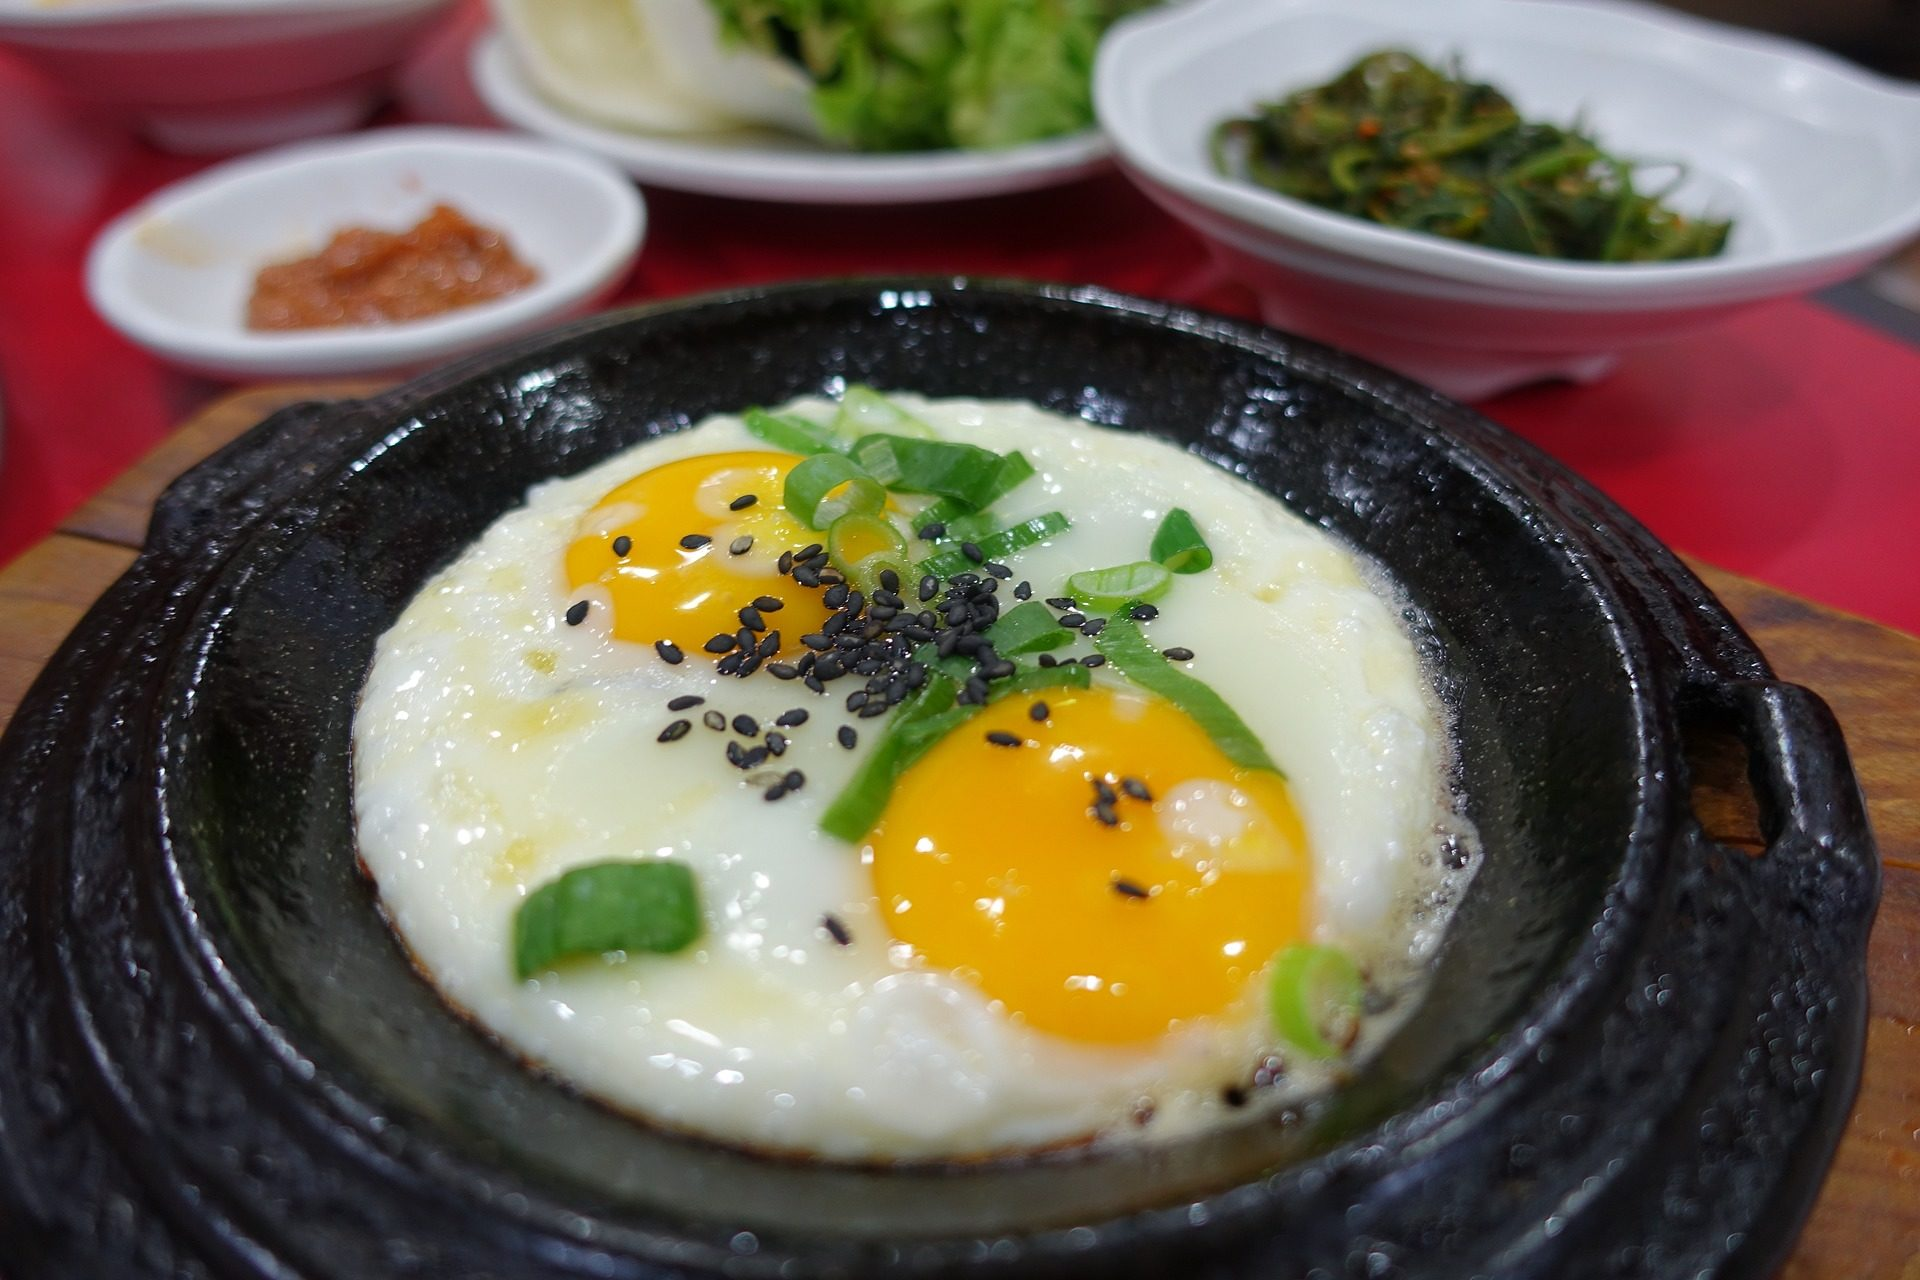 huevos, fritos, yemas, aderezos, cuenco, gastronomía - Fondos de Pantalla HD - professor-falken.com